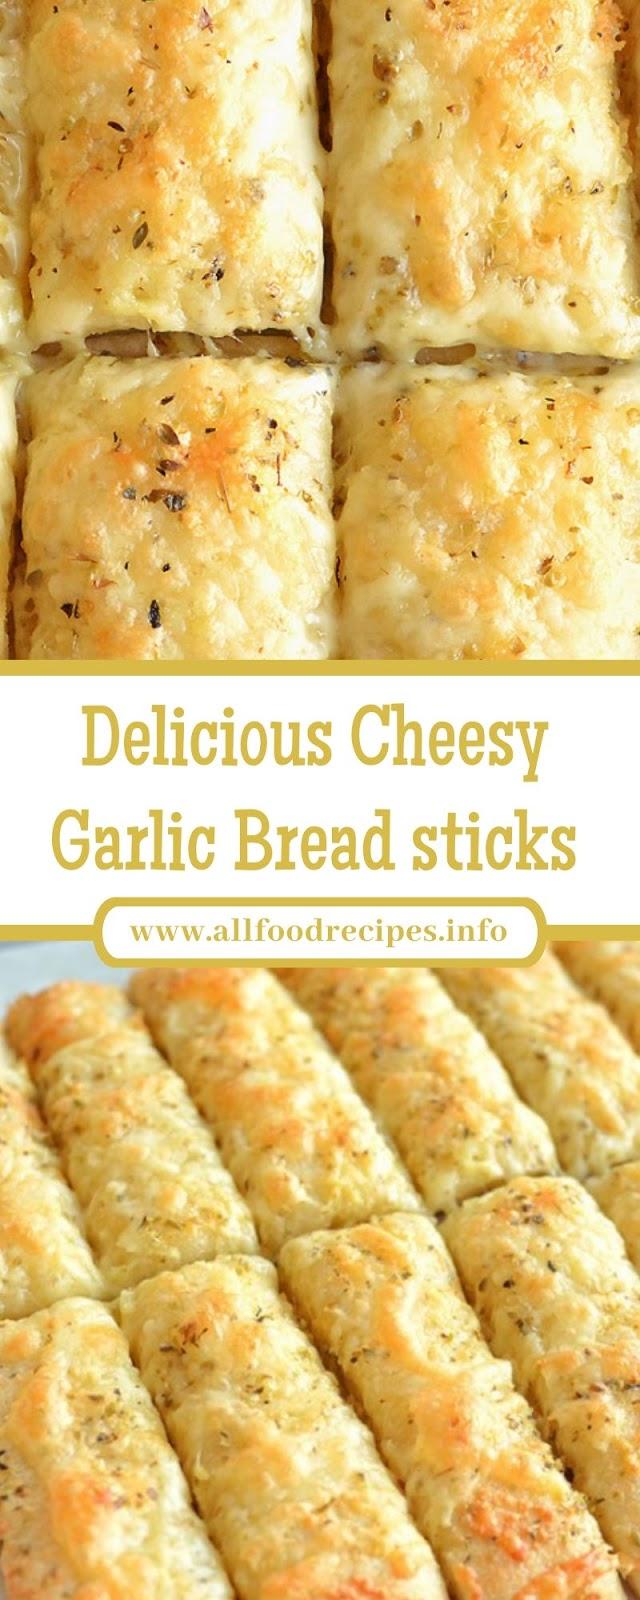 Delicious Cheesy Garlic Bread sticks